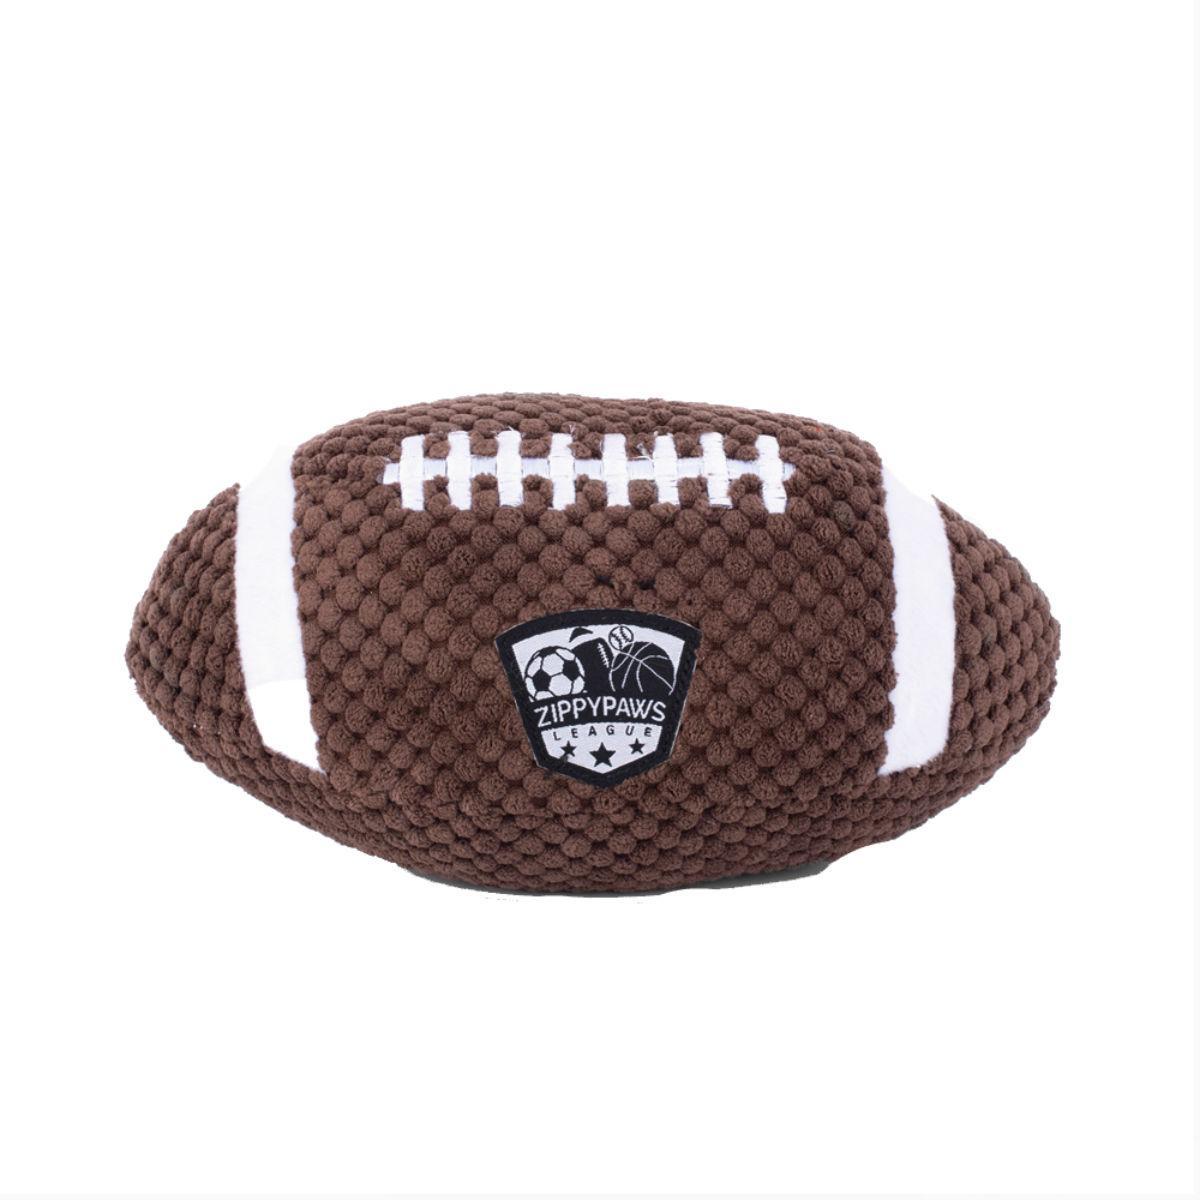 ZippyPaws SportsBallz Dog Toy - Football